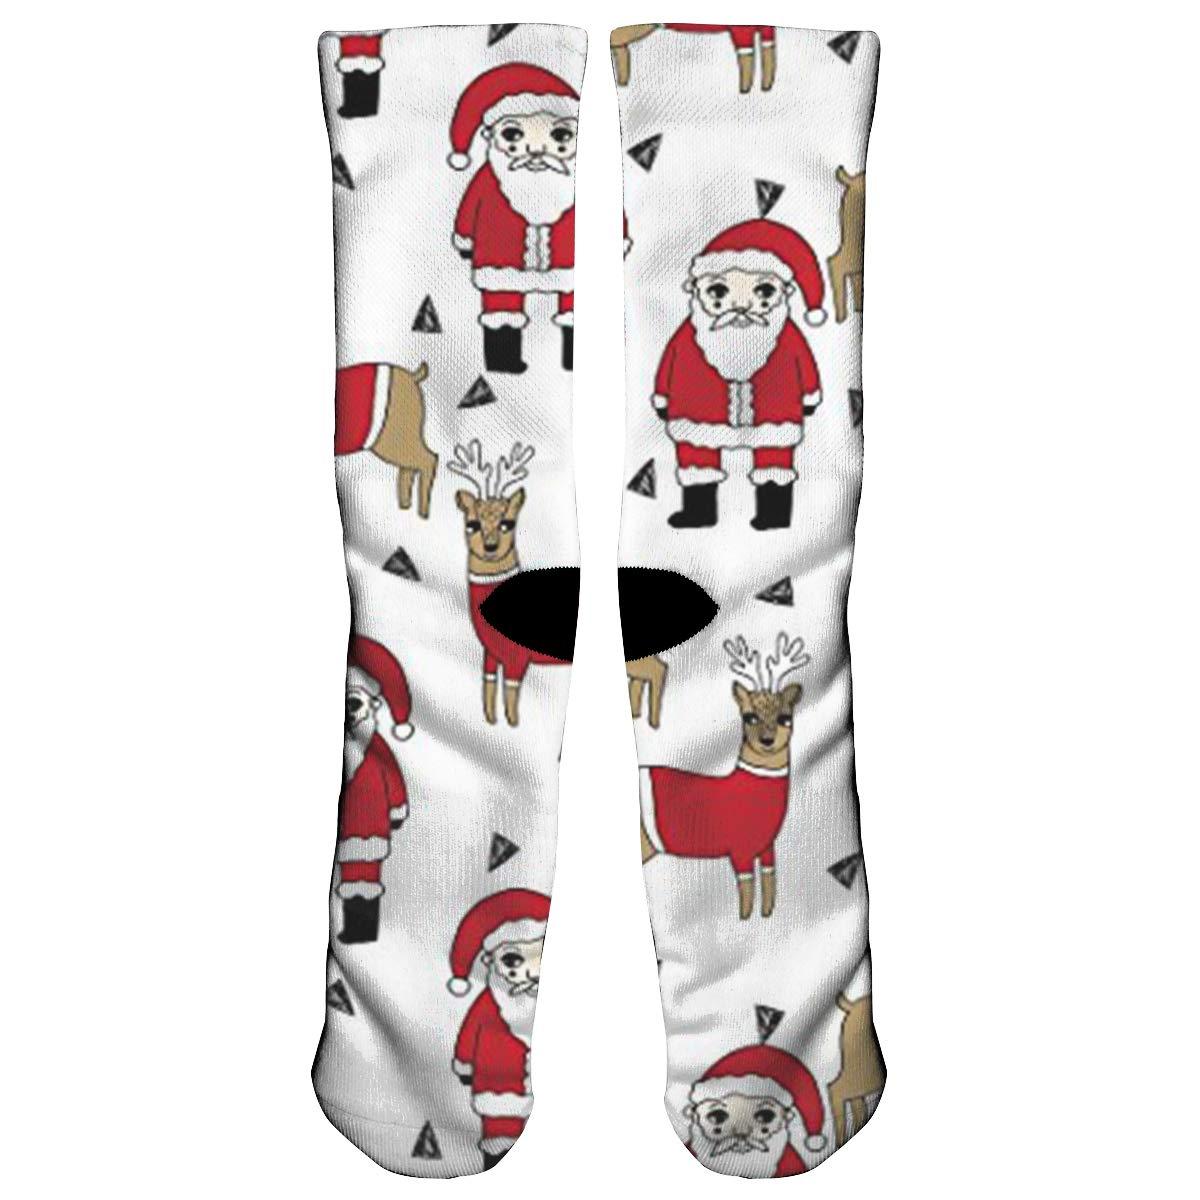 7166a3a2ed KOPTZA Santa and Reindeer Xmas Holiday Athletic Tube Stockings Women Men  Classics All-Season Cotton Crew Work Socks Sport Long Sock for Running  Cycling ...